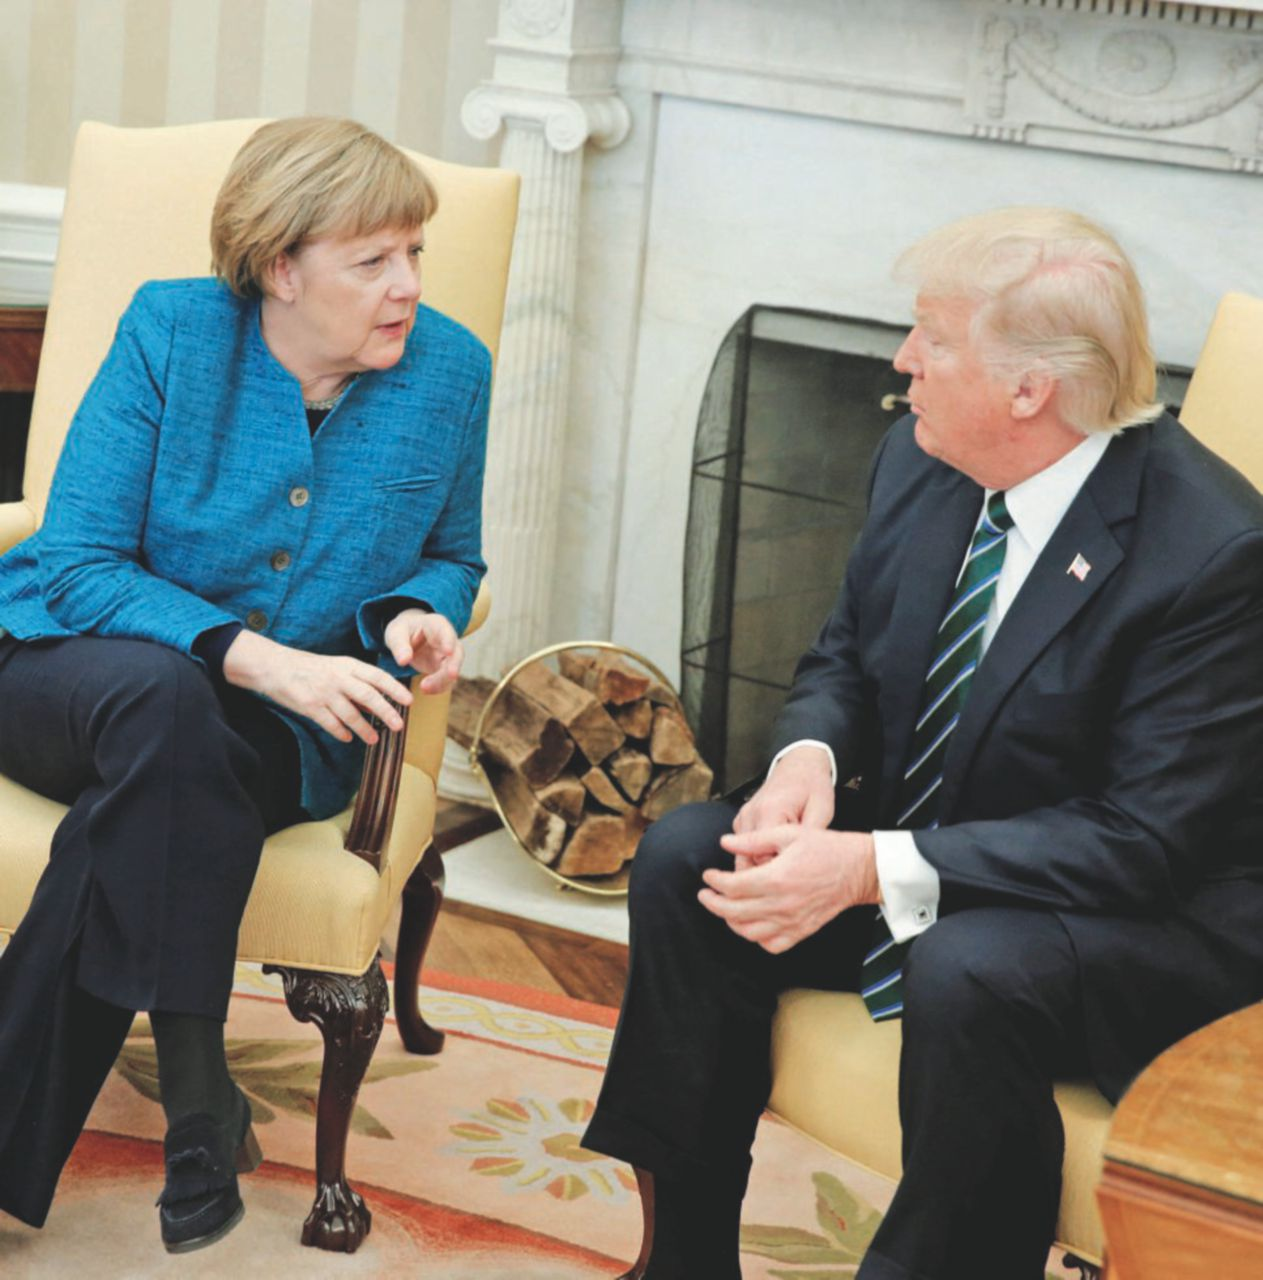 L'alleanza fredda: Trump gigioneggia con Frau Merkel